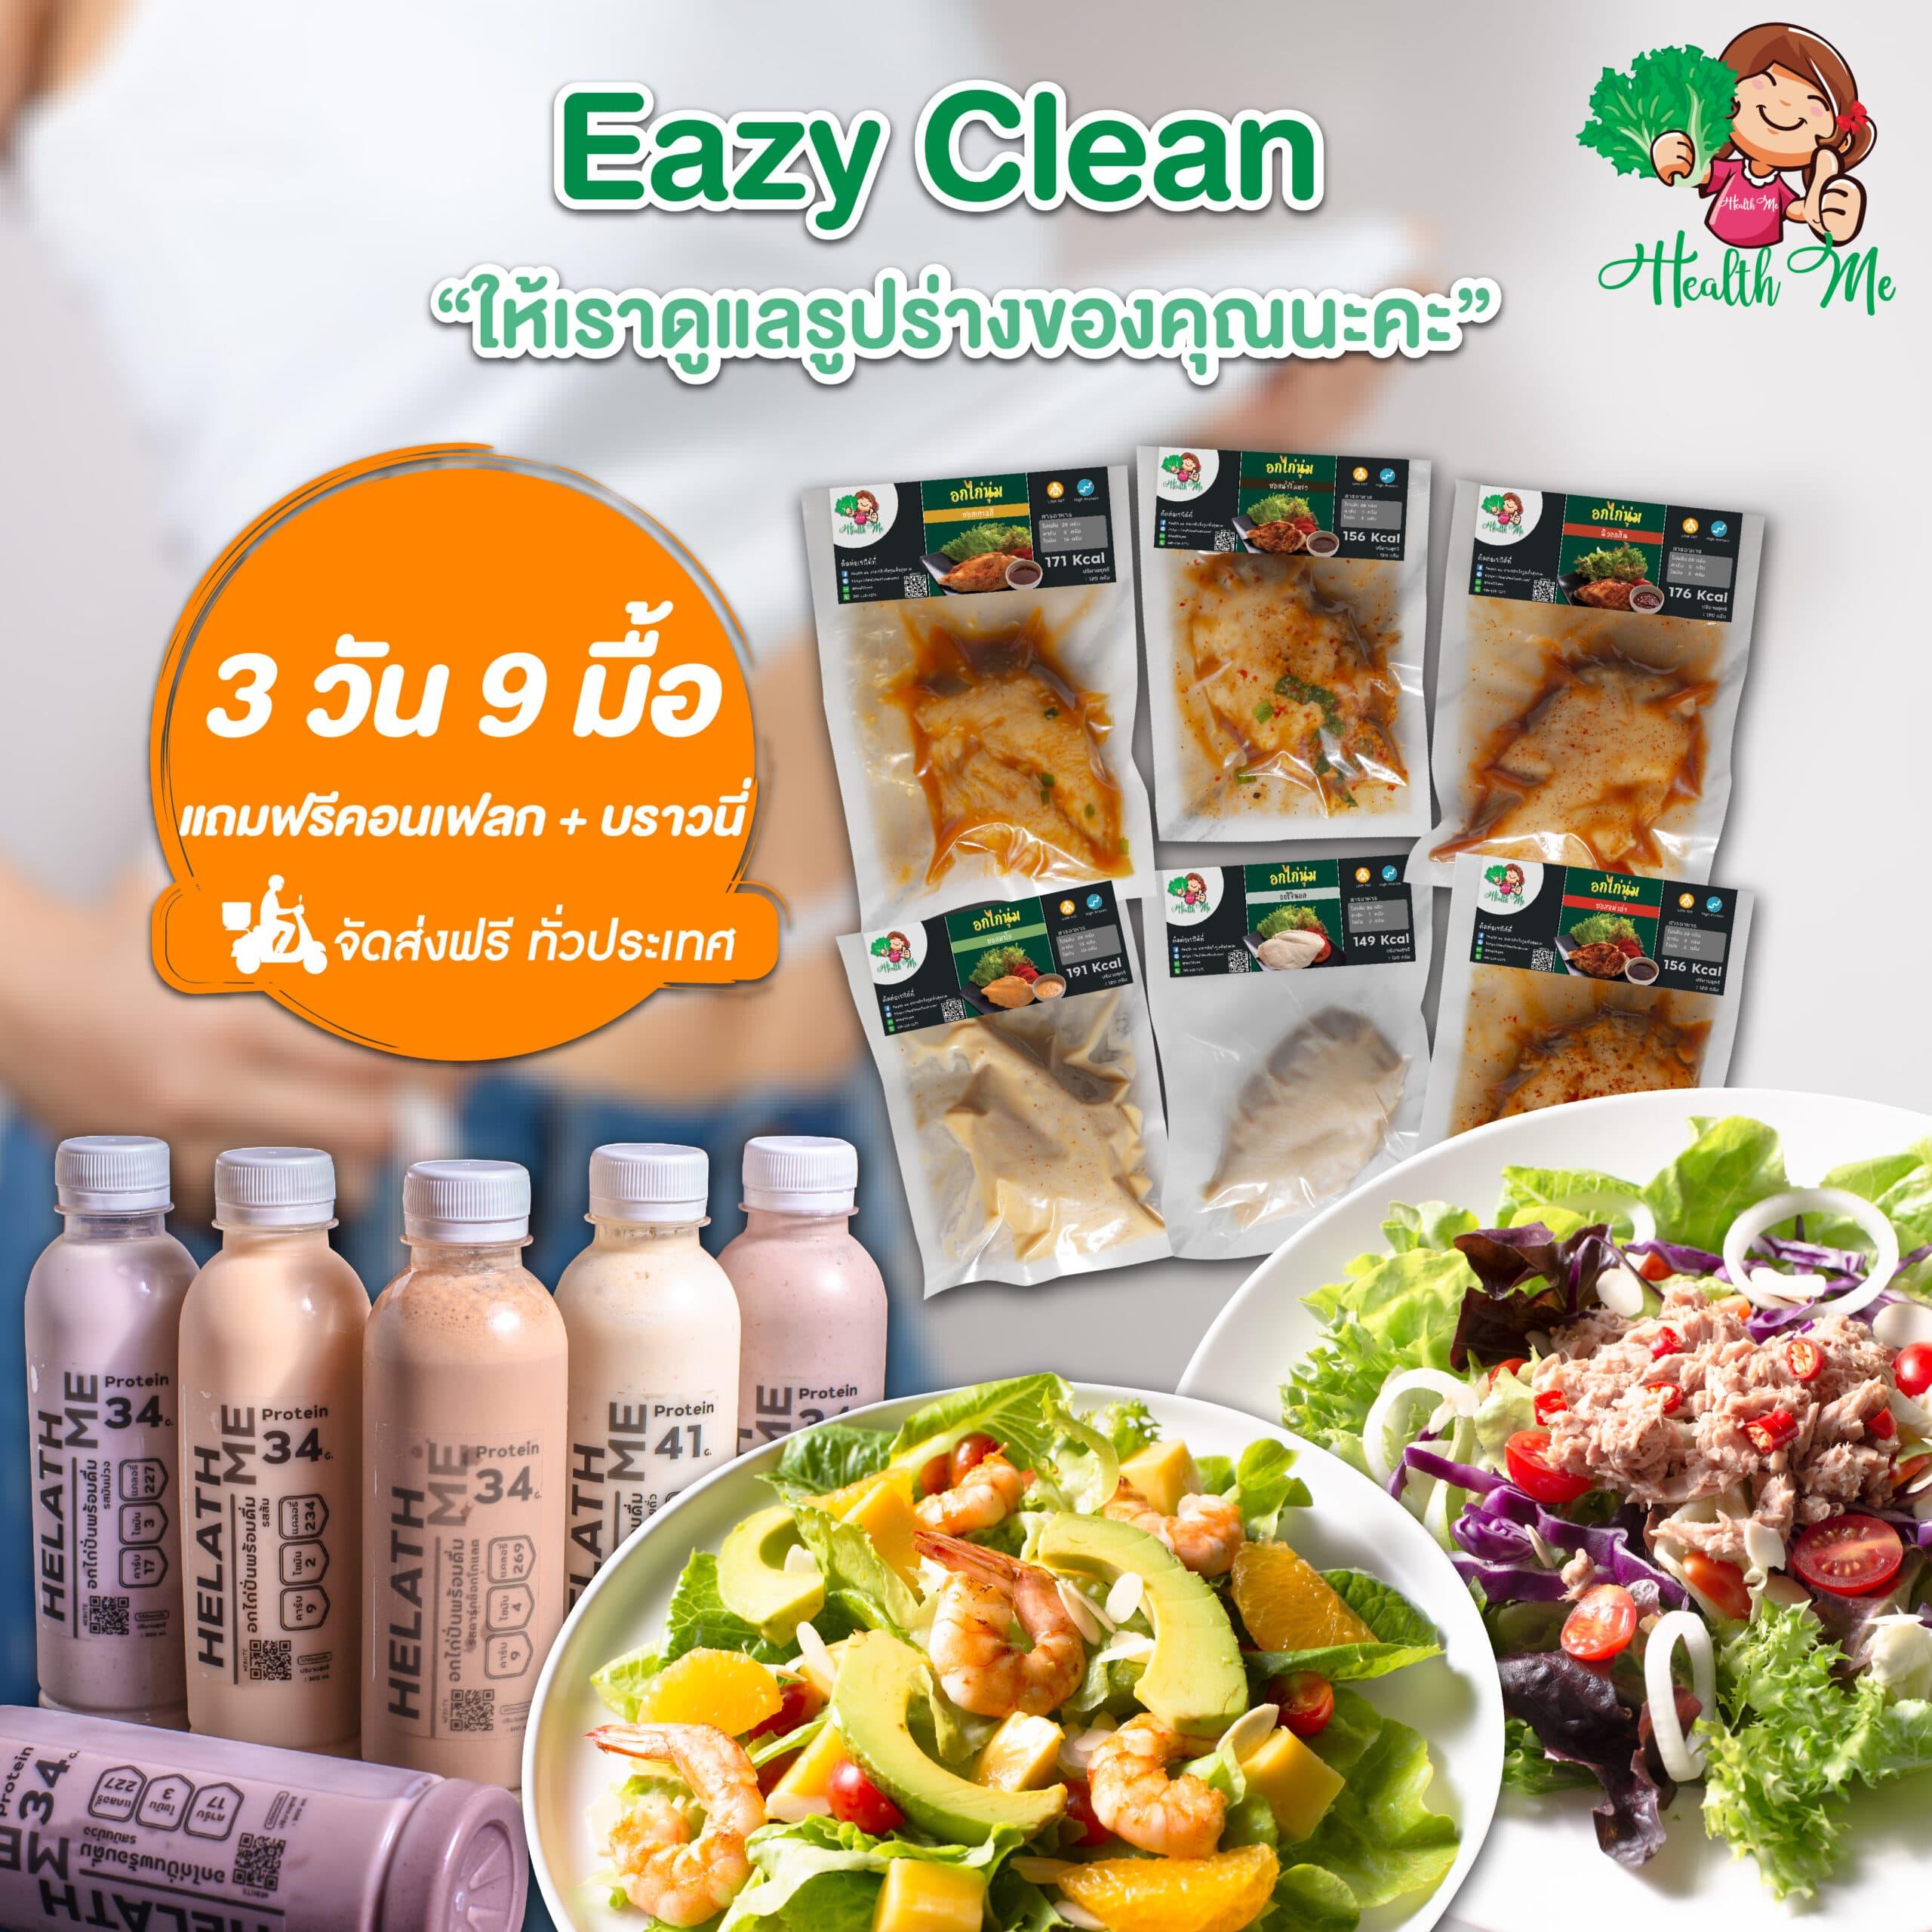 Eazy-Clean